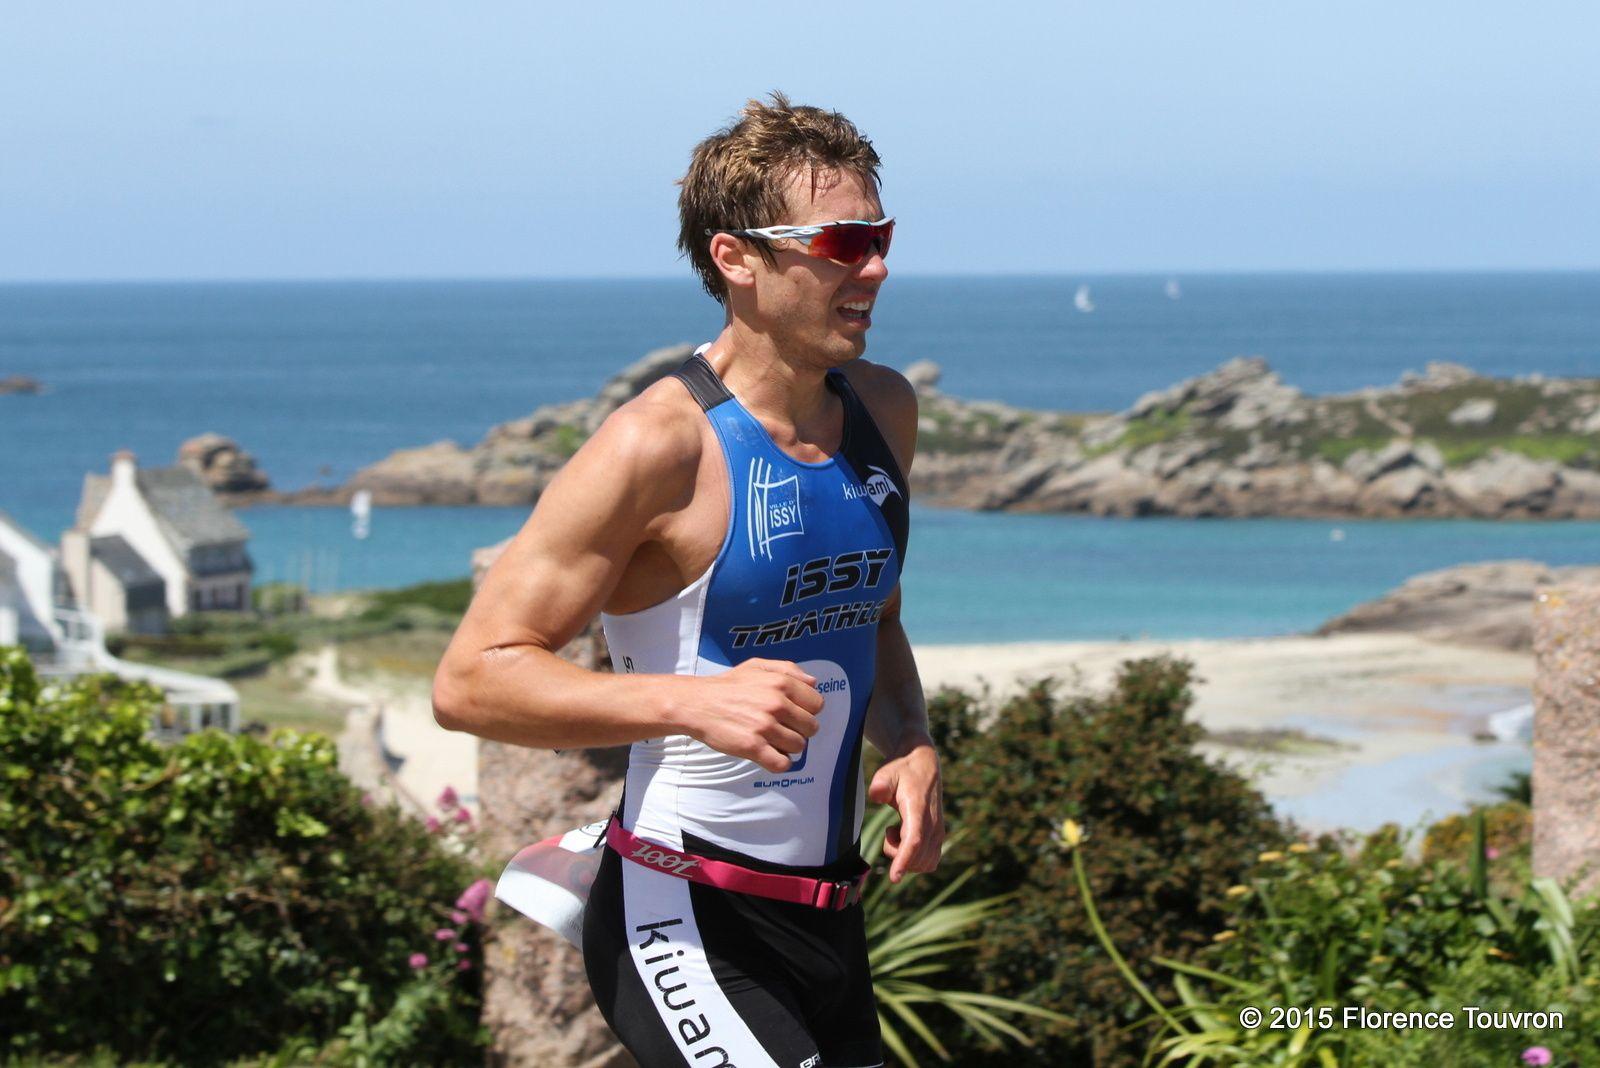 Triathlon de la cote de granit rose 2015